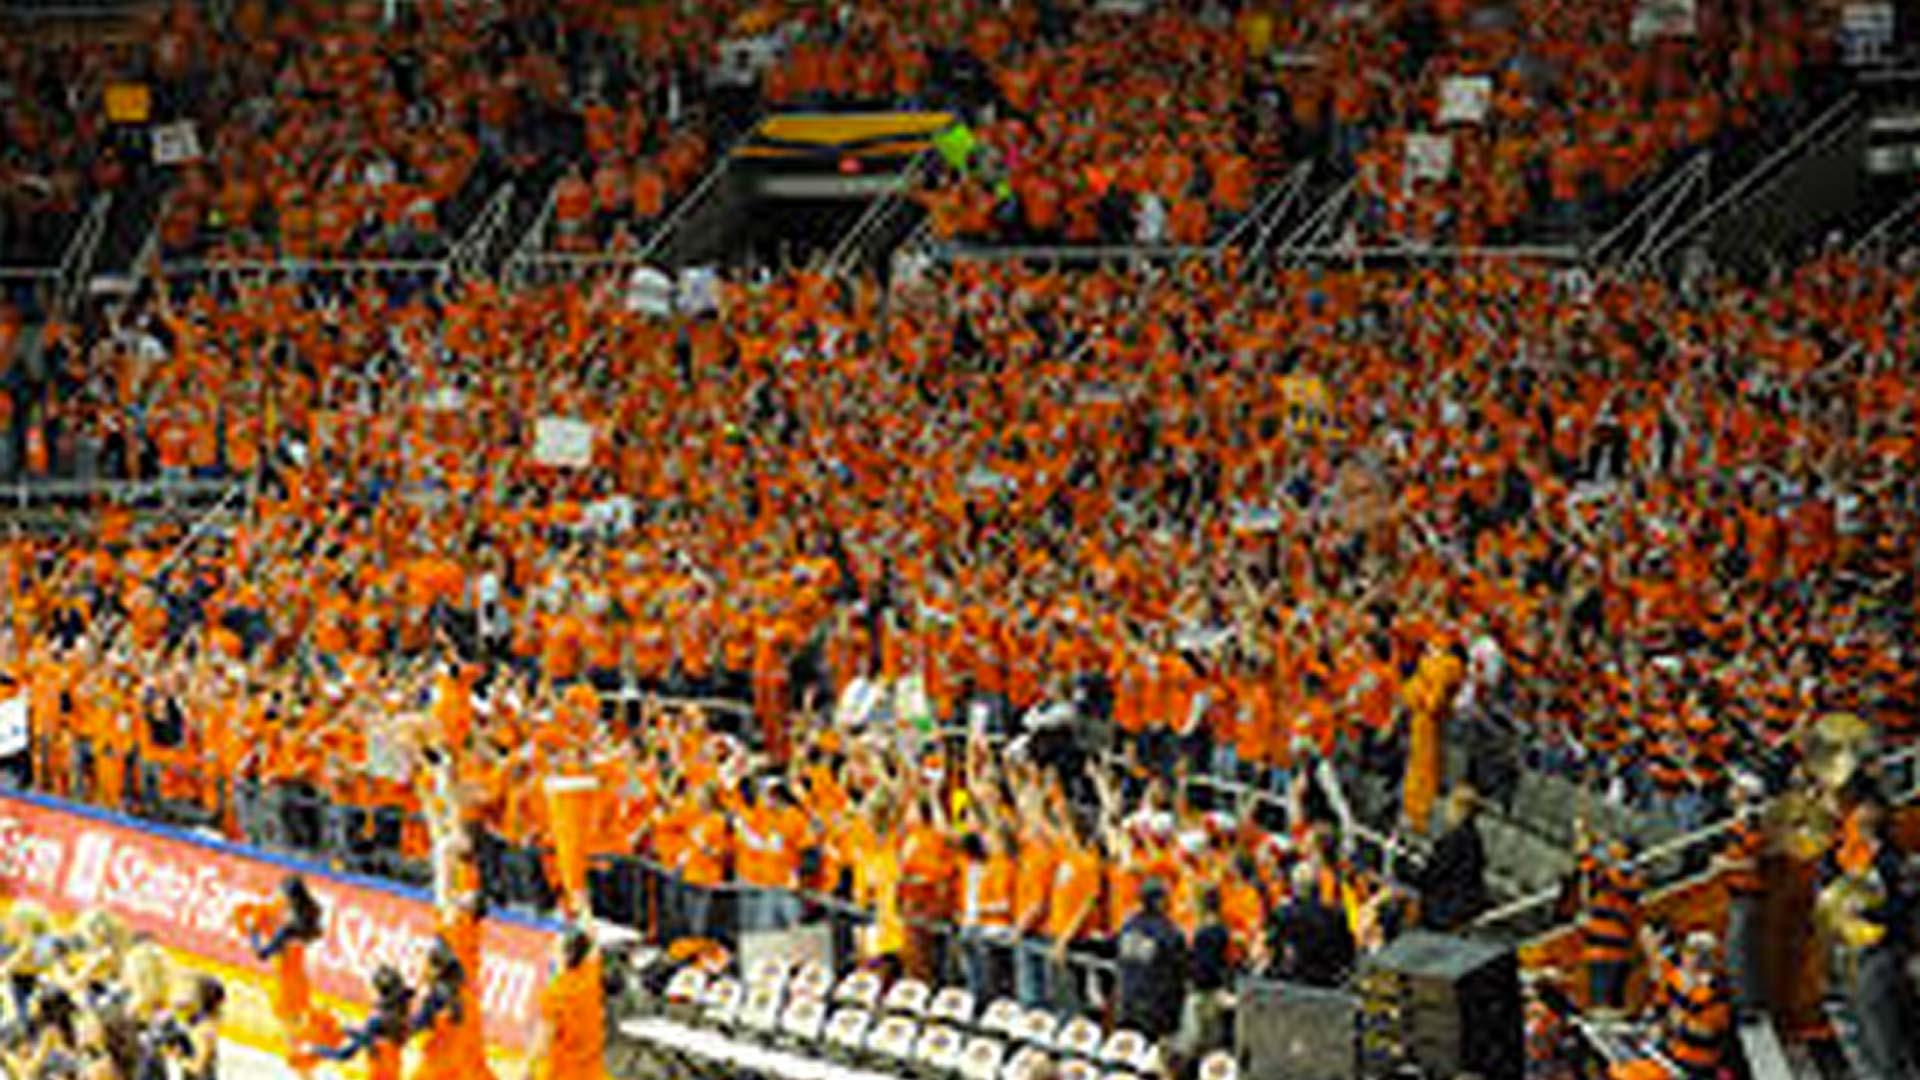 illinois-orange-krush-020814-youtube-ftr